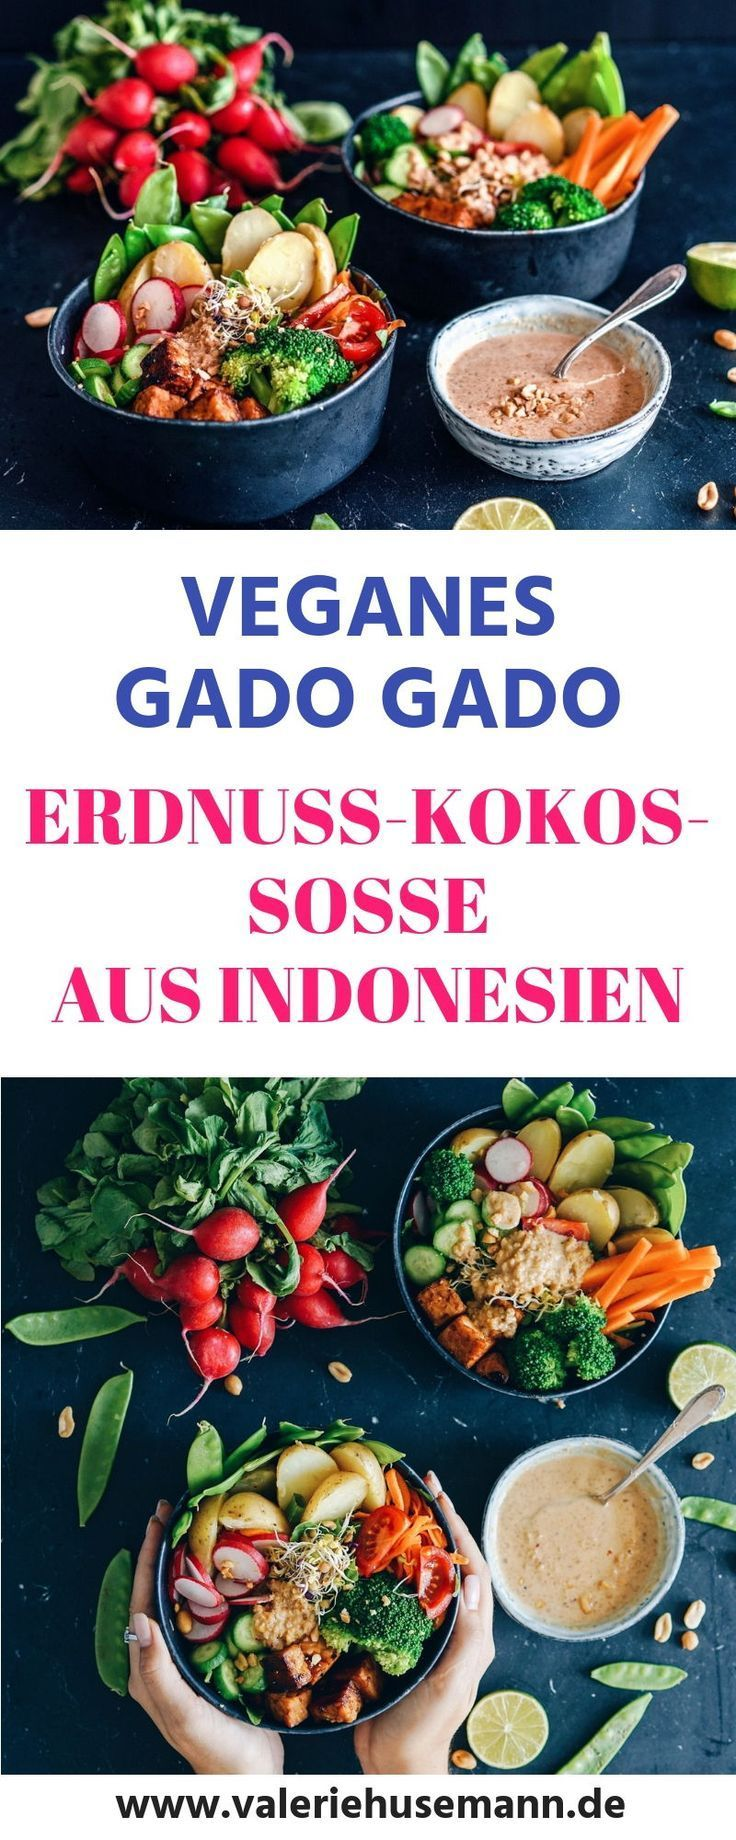 Erdnuss-Kokos-Sauce aus Indonesien, vegan – Vega…